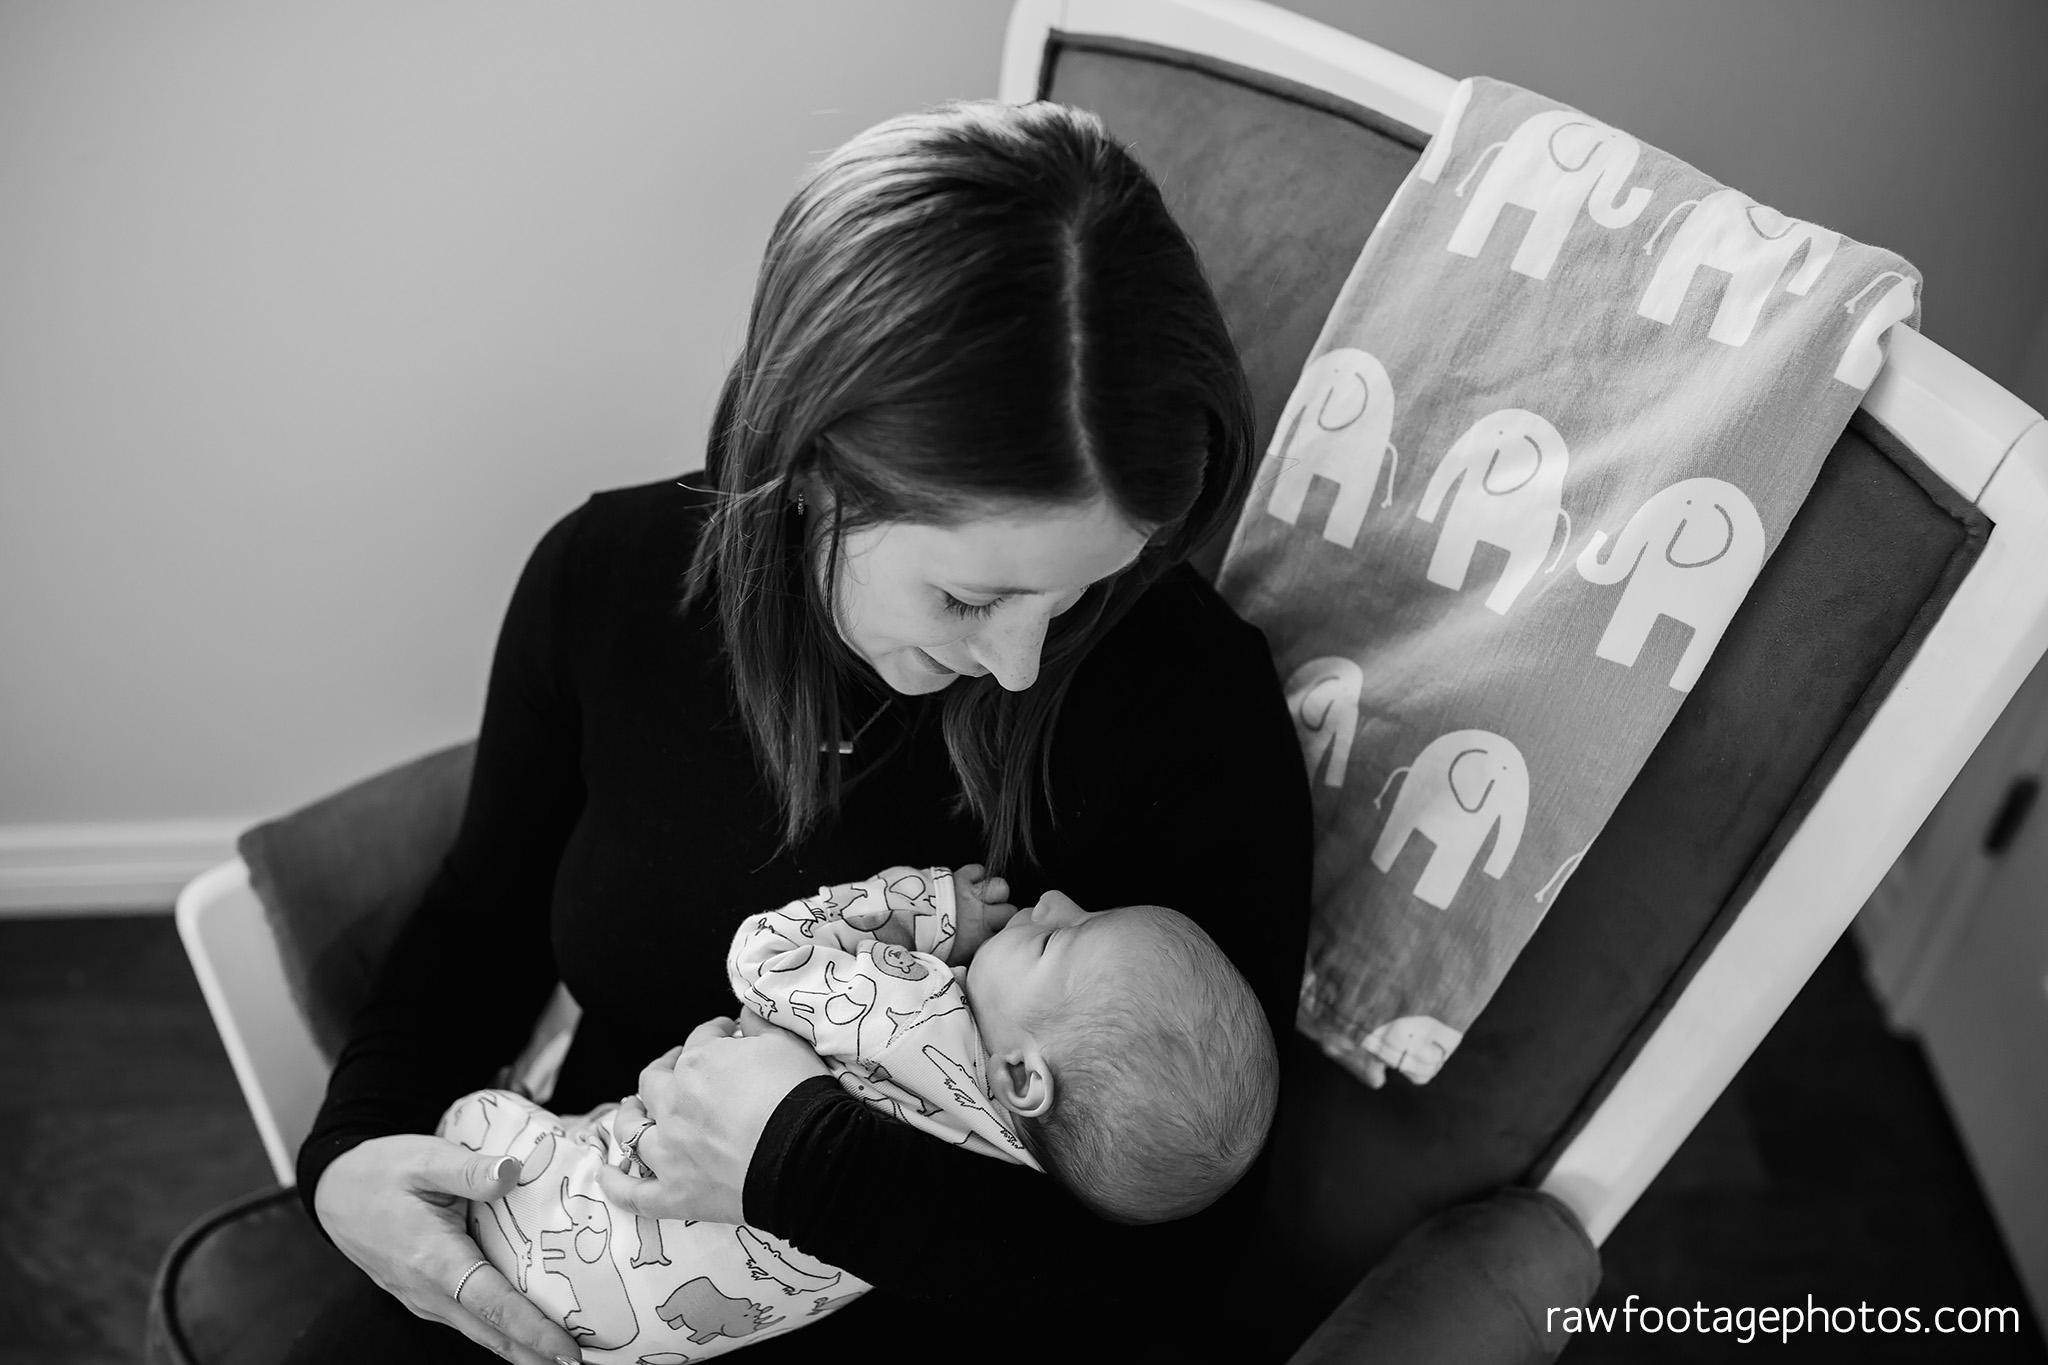 london_ontario_newborn_lifestyle_photographer-baby_nate-raw_footage_photography030.jpg